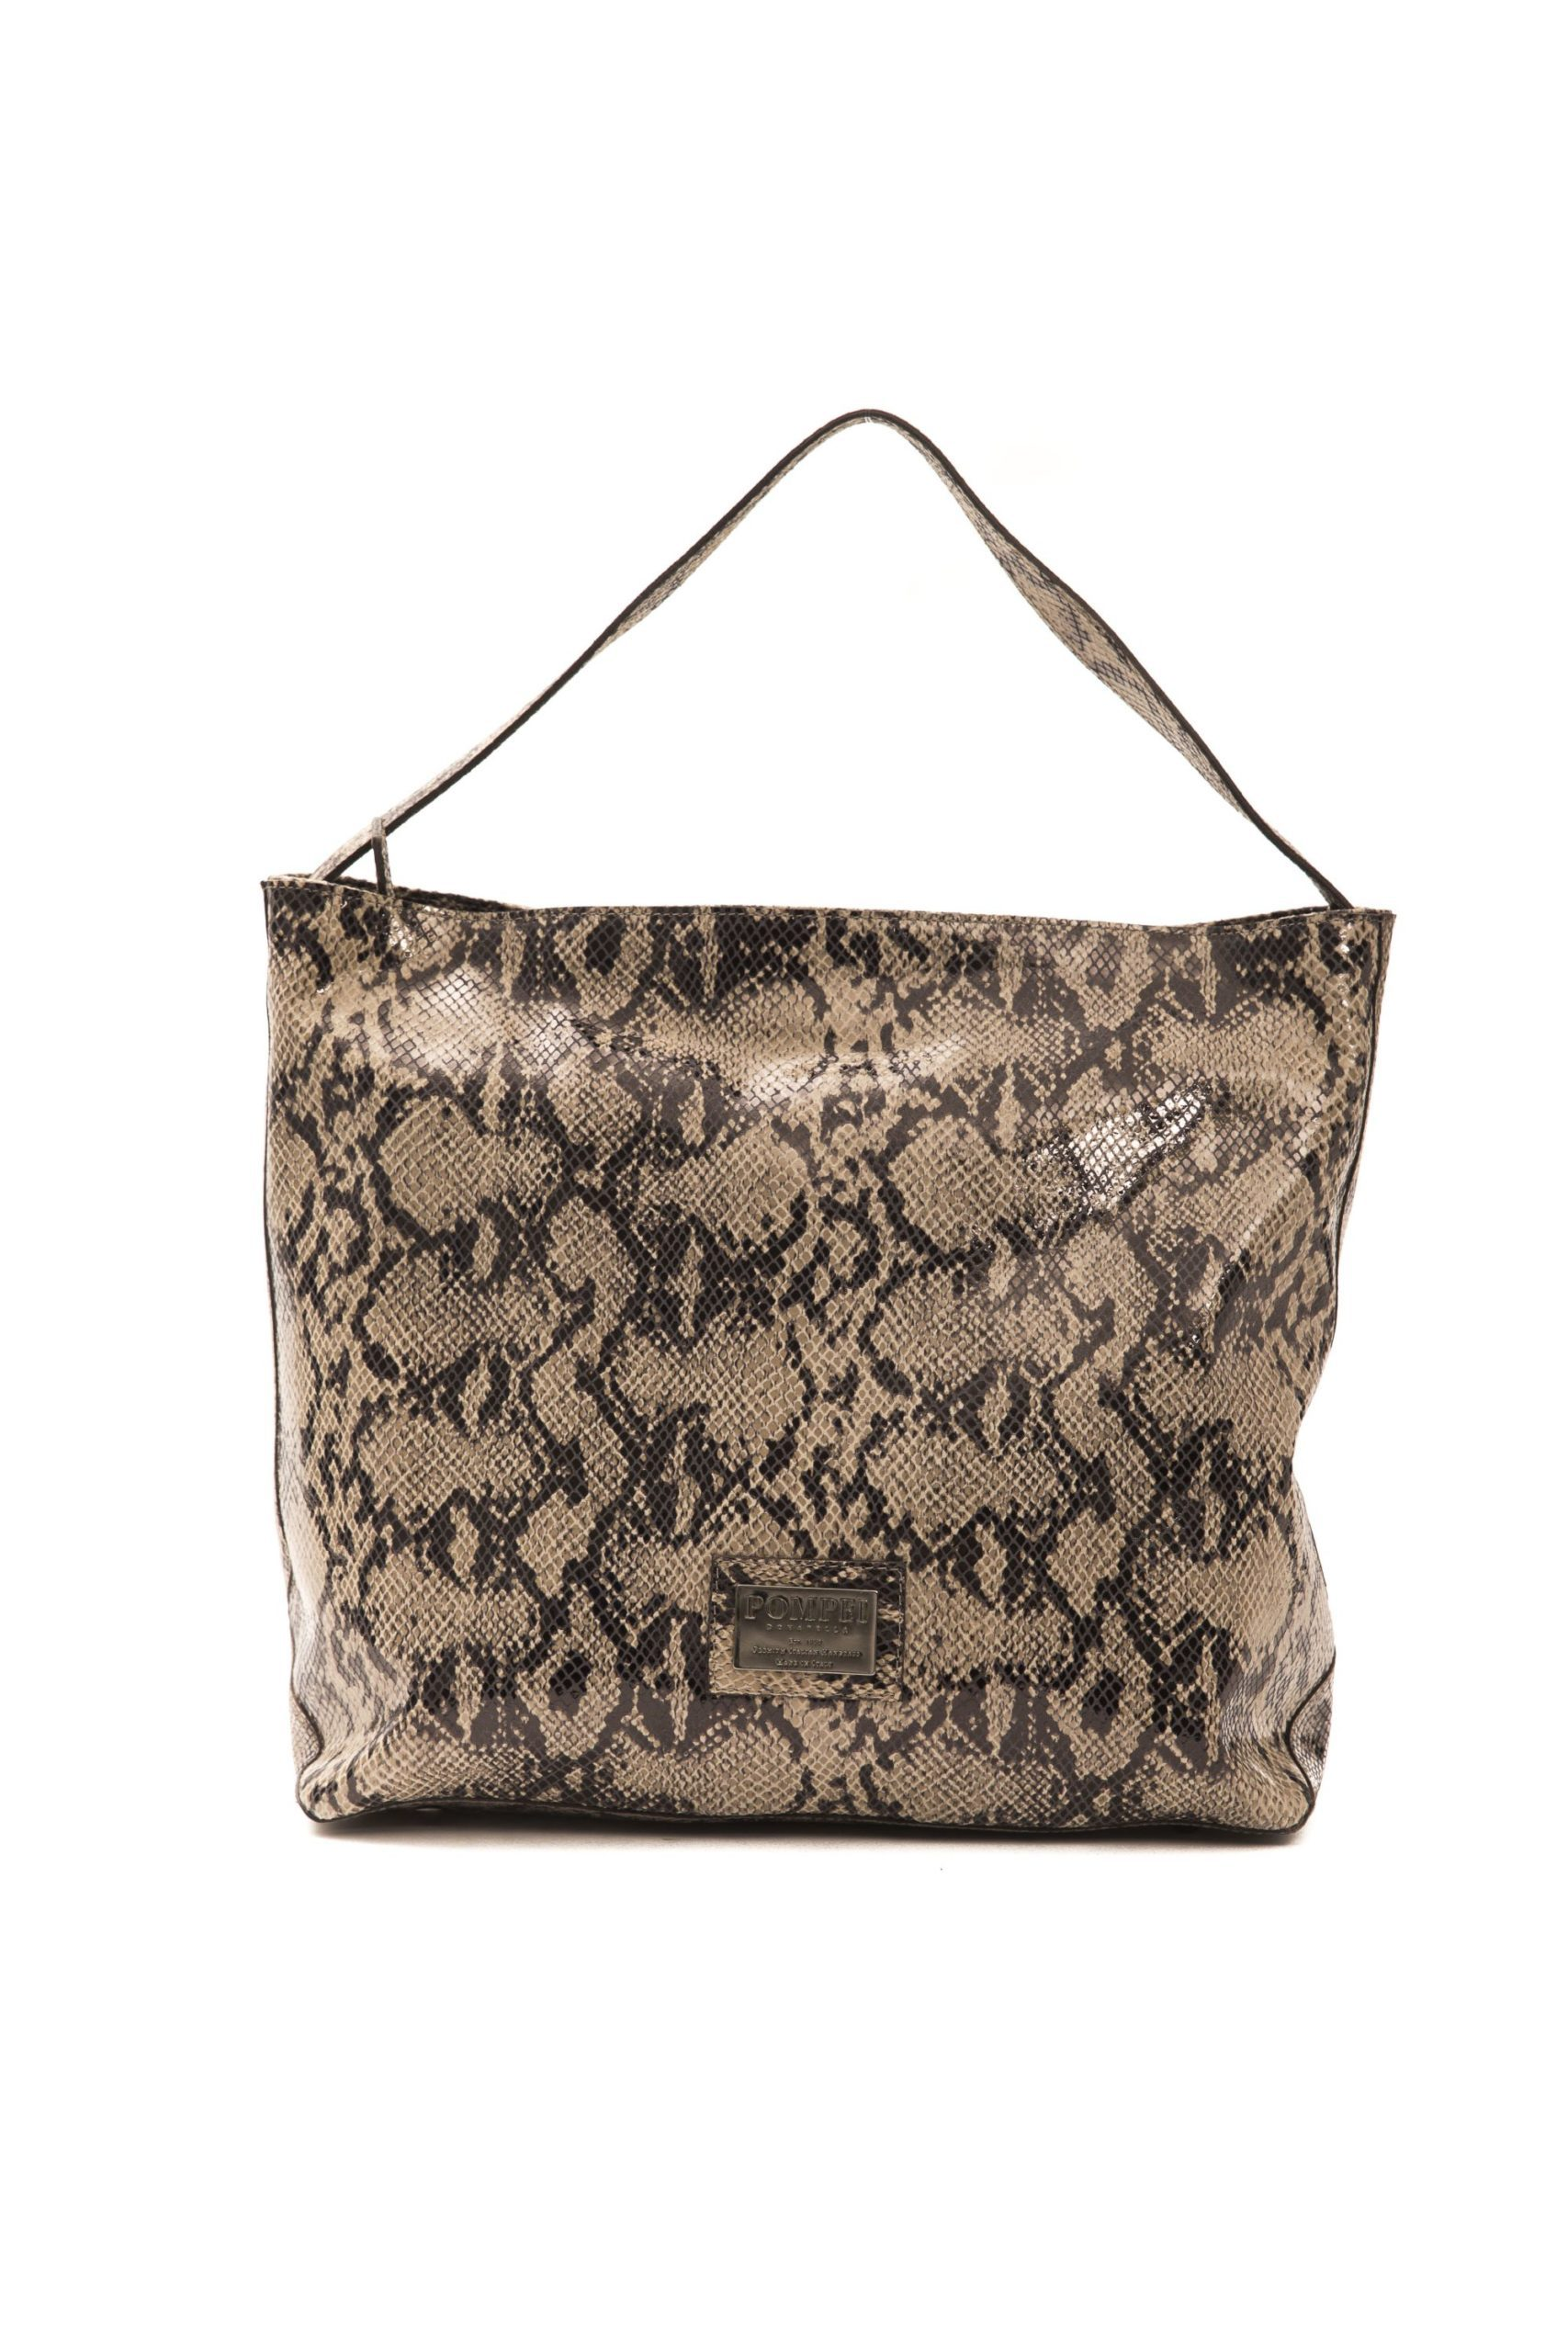 Pompei Donatella Women's Tortora Taupe Shoulder Bag Brown PO1004555